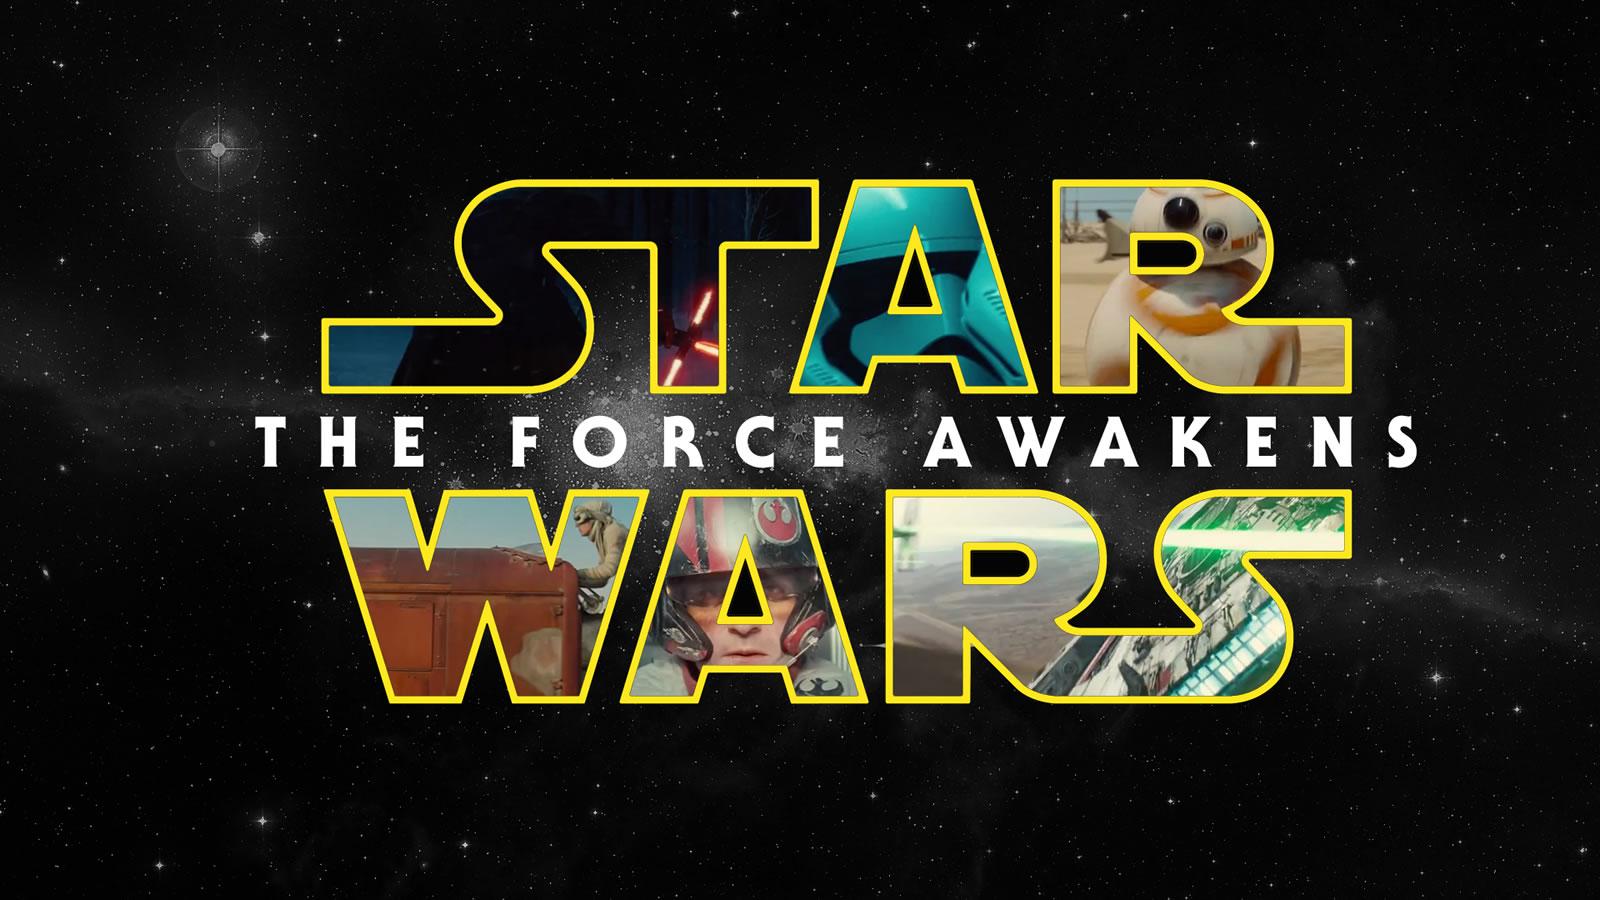 Star Wars The Force Awakens Wallpaper 5   Windows 10 News and Updates 1600x900